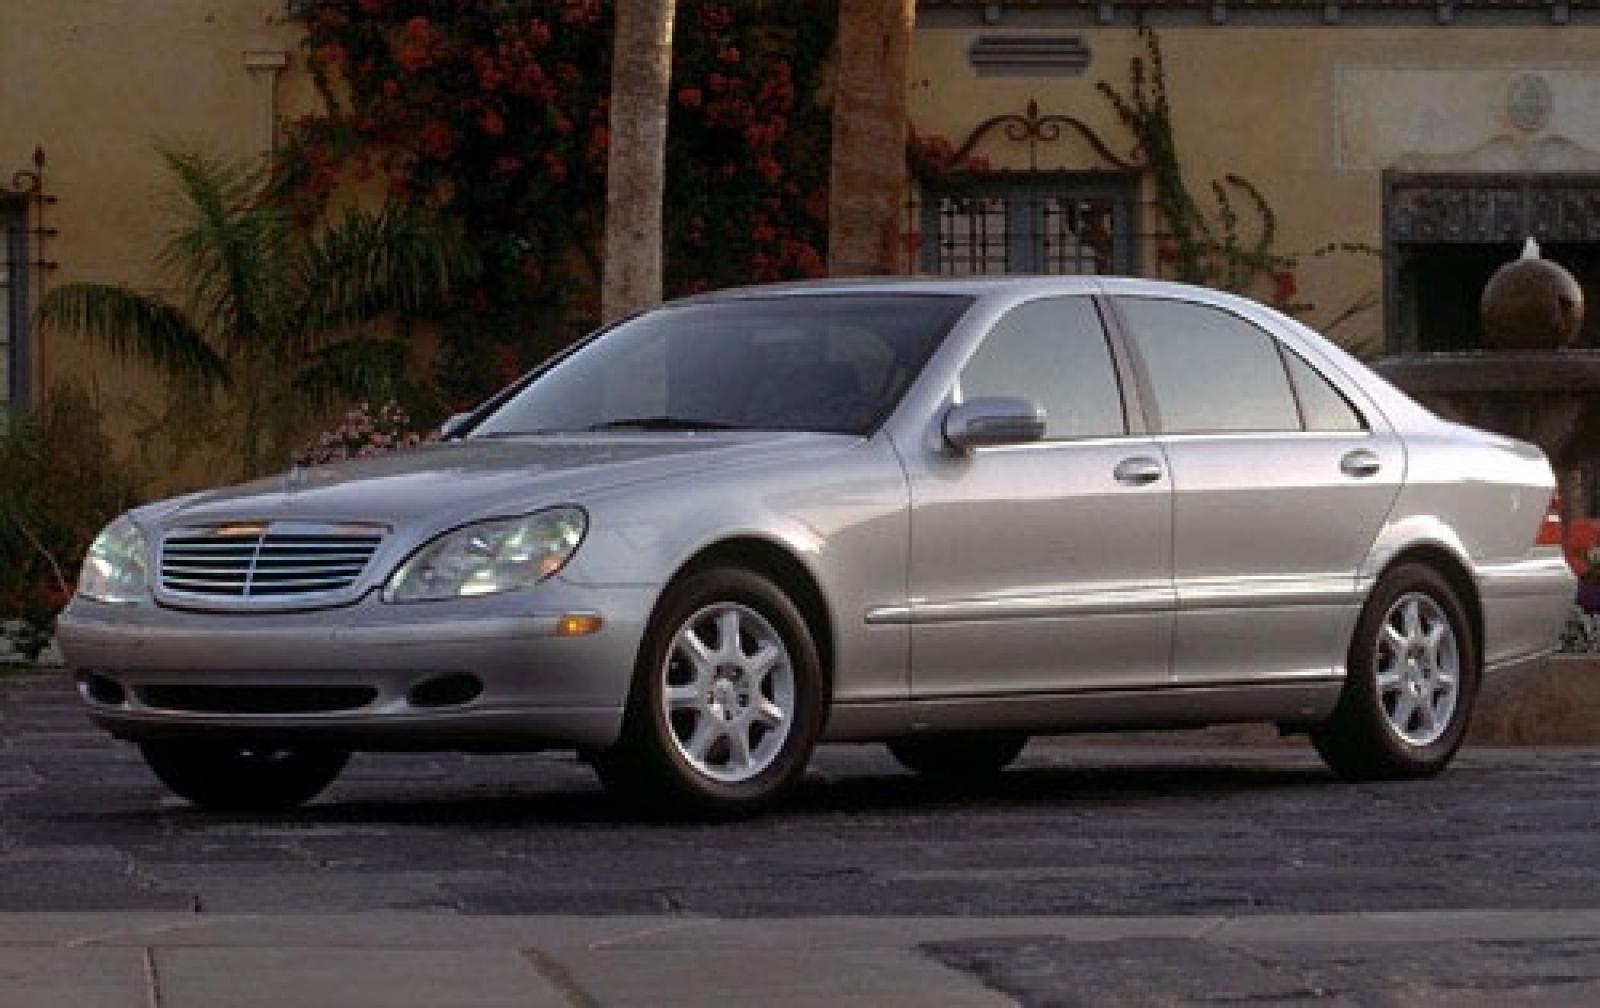 2002 Mercedes-Benz S-Class #1 800 1024 1280 1600 origin